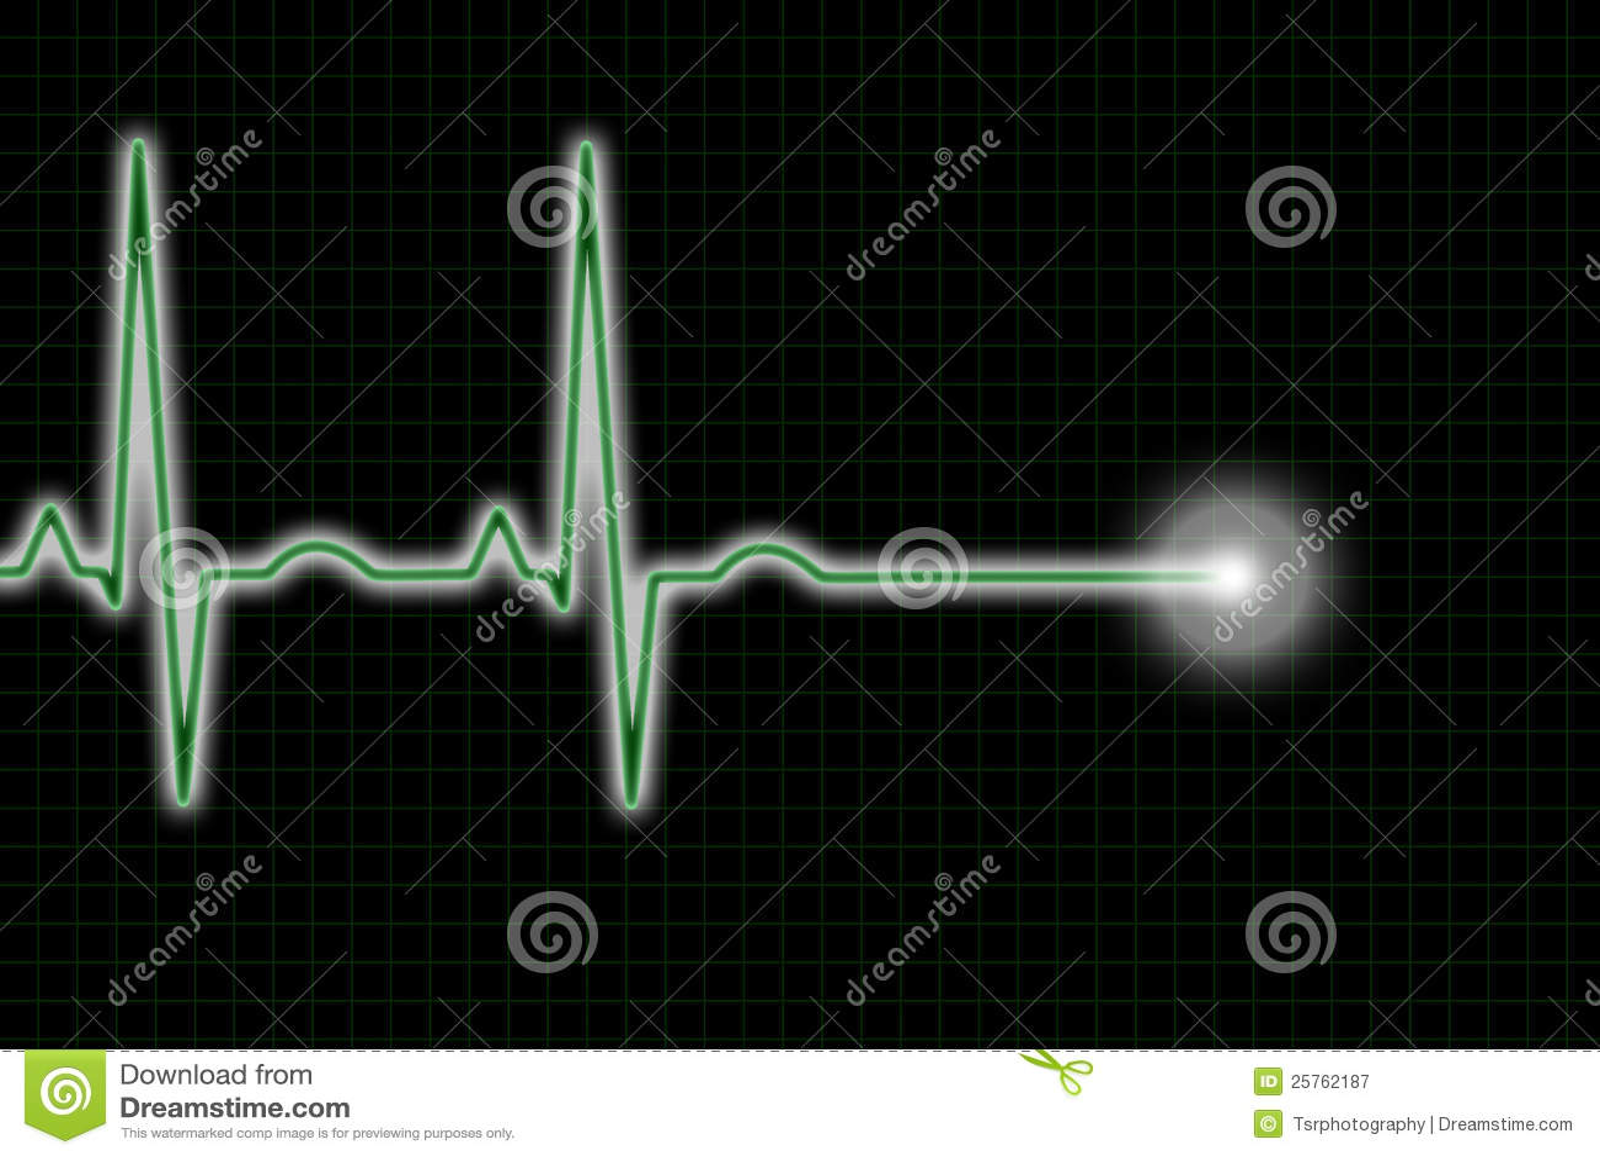 Green Black Ecg Trace Heart Rhythm Illustrations Royalty Free